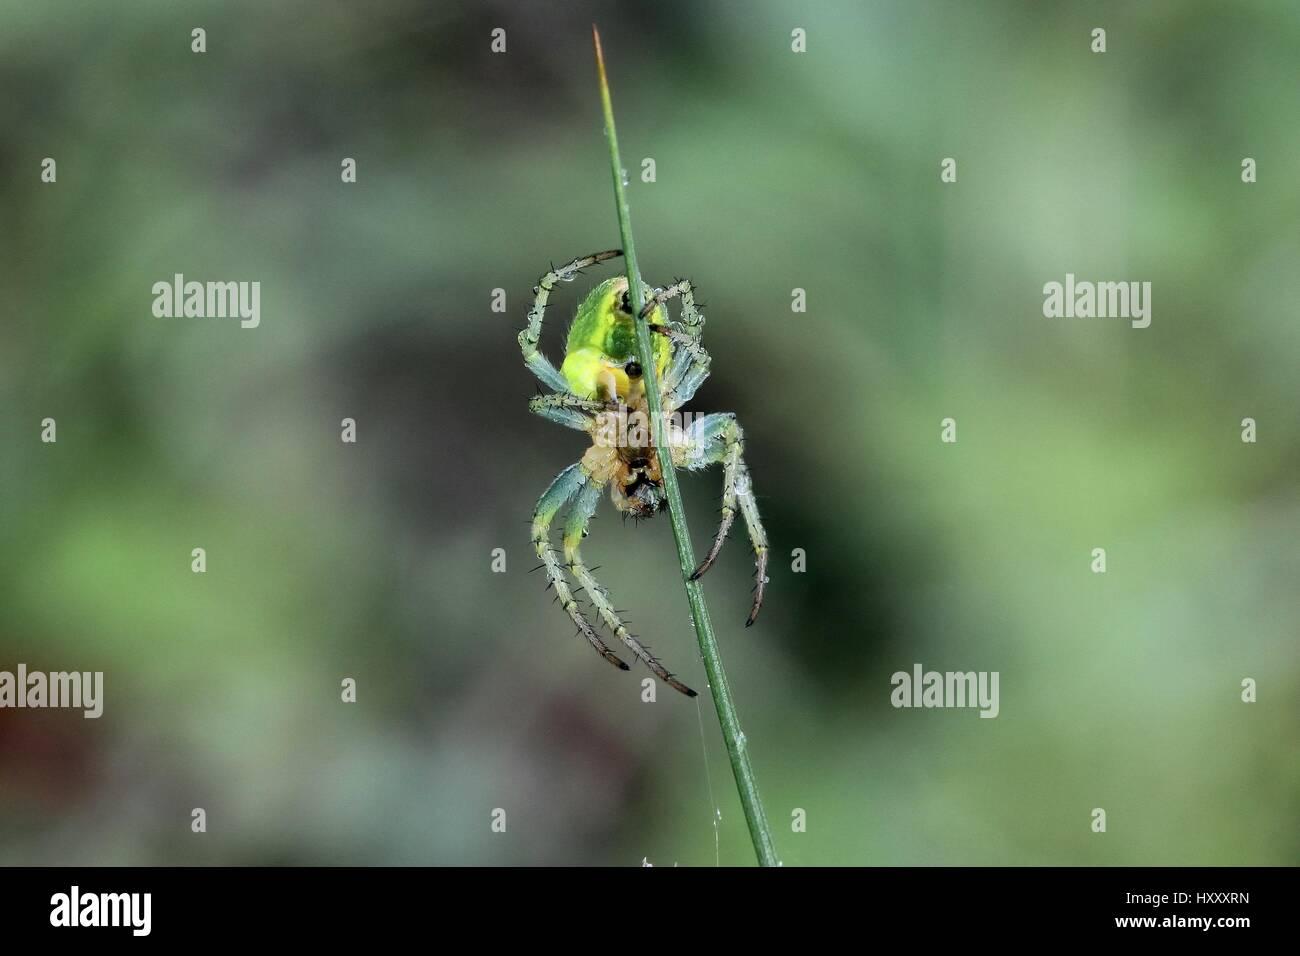 Cucumber Green Spider, Araniella cucurbitina - Stock Image